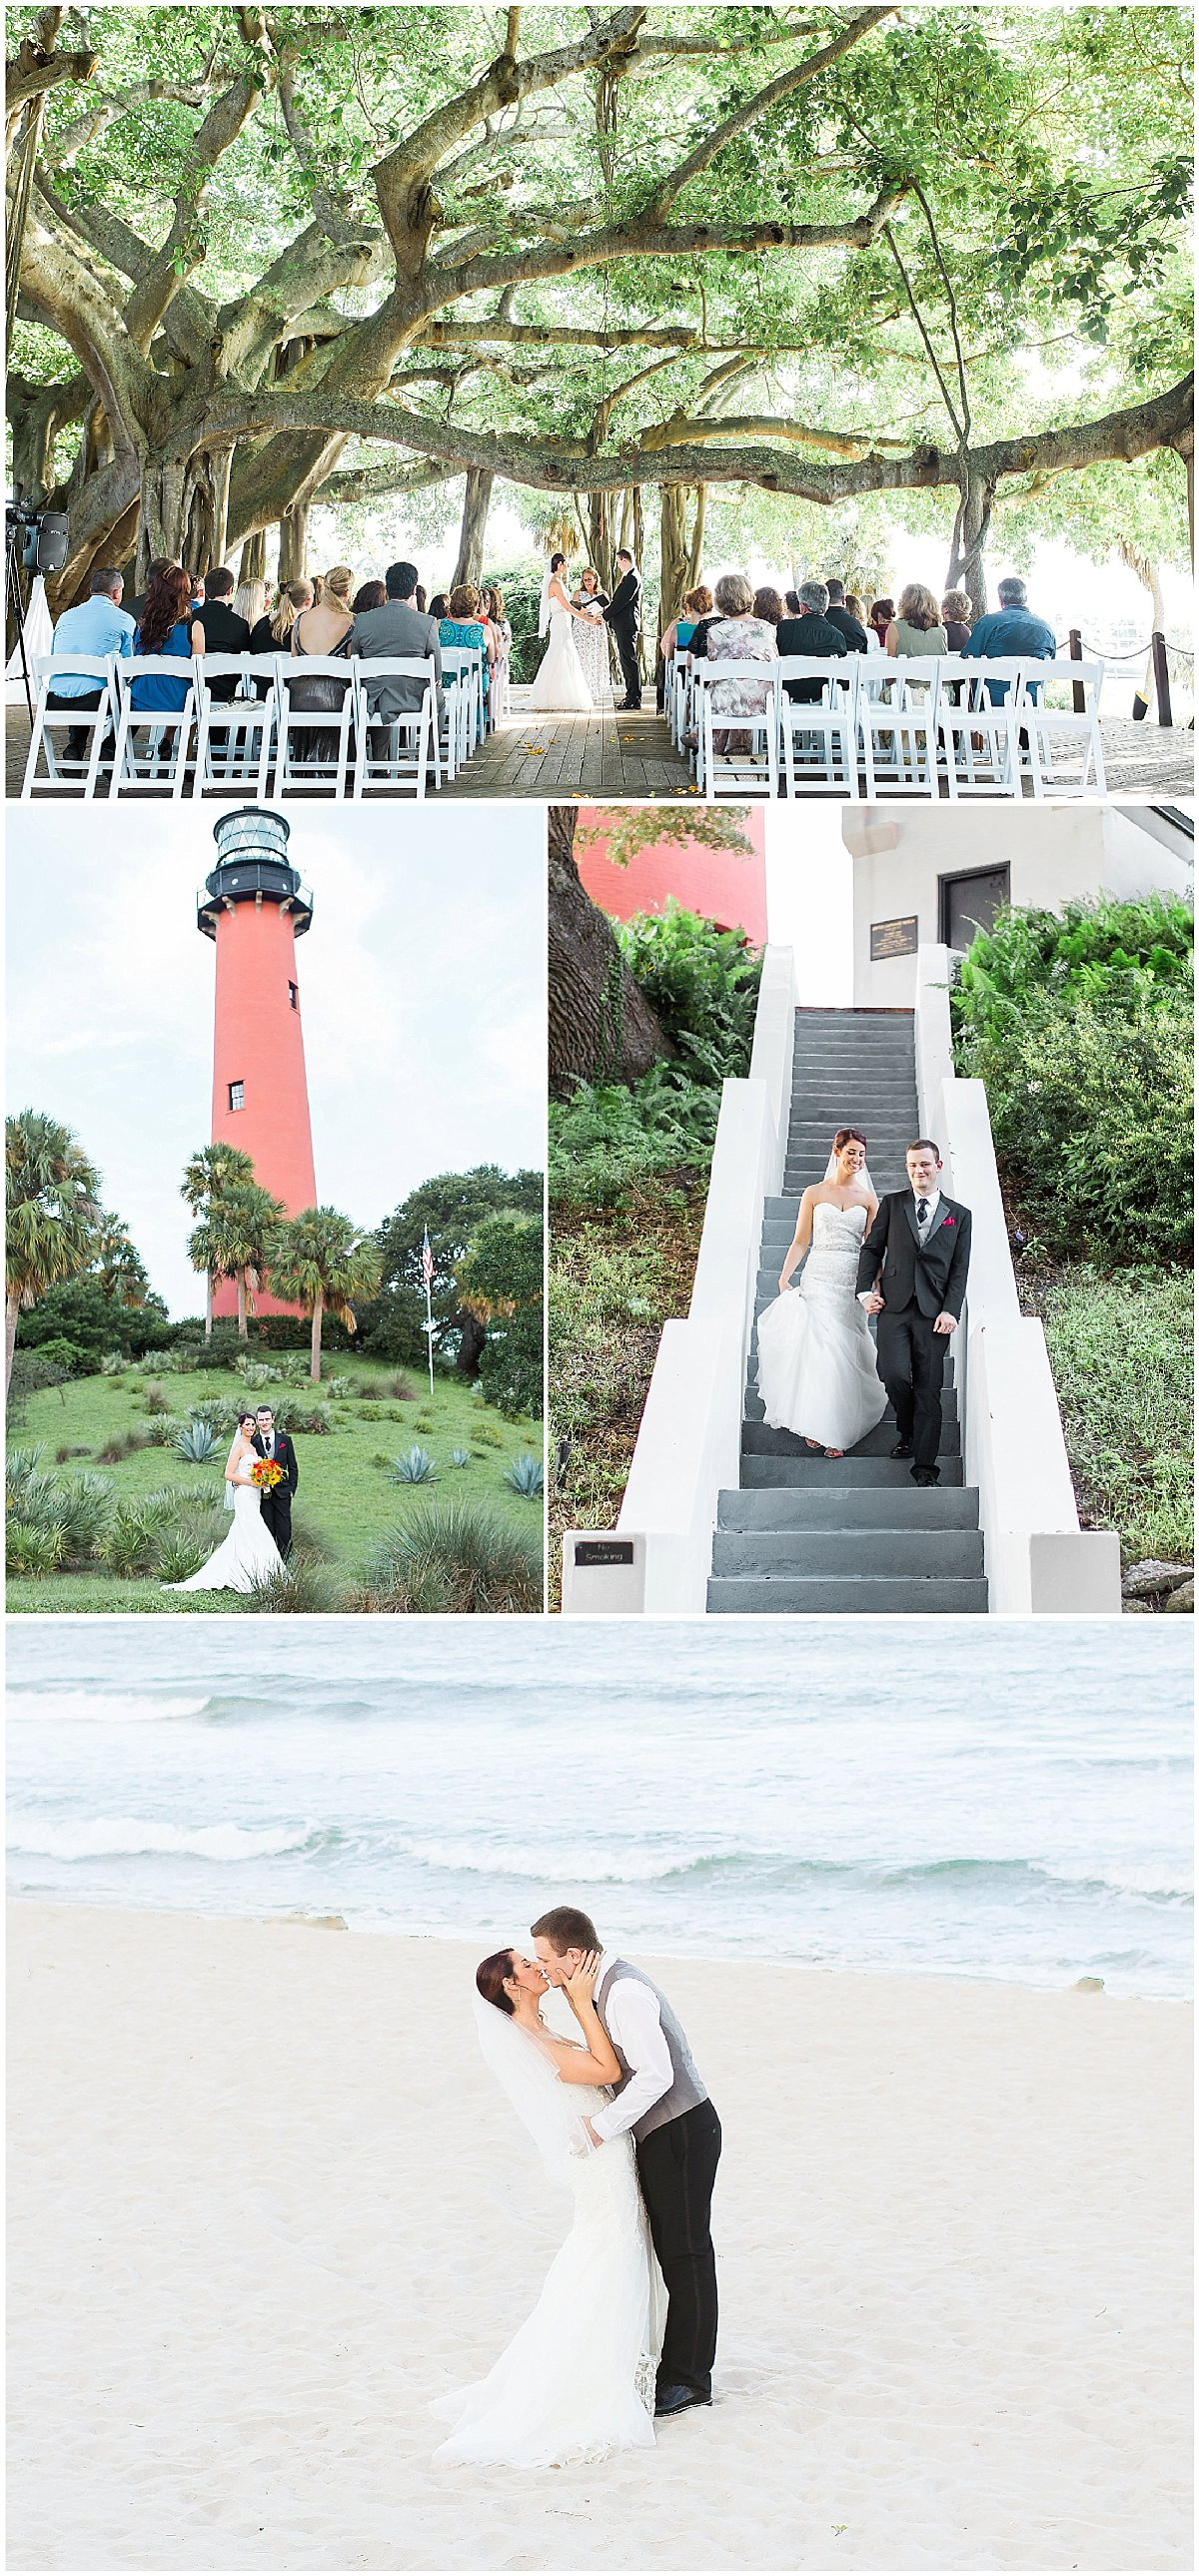 Amazing Beach Wedding Venues – Married in Palm Beach